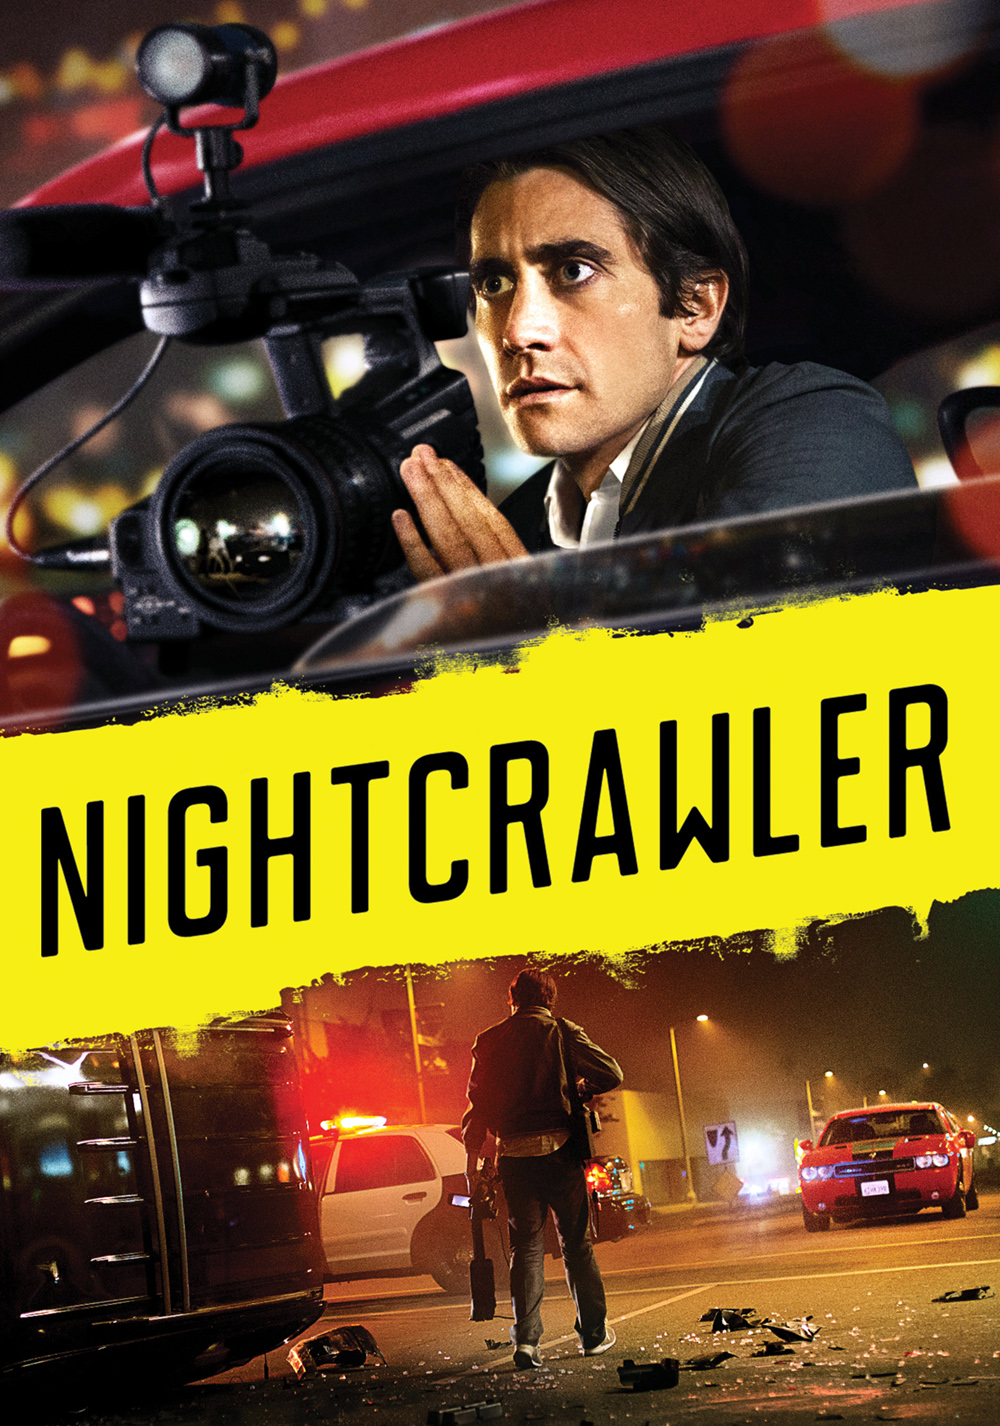 Stream Nightcrawler